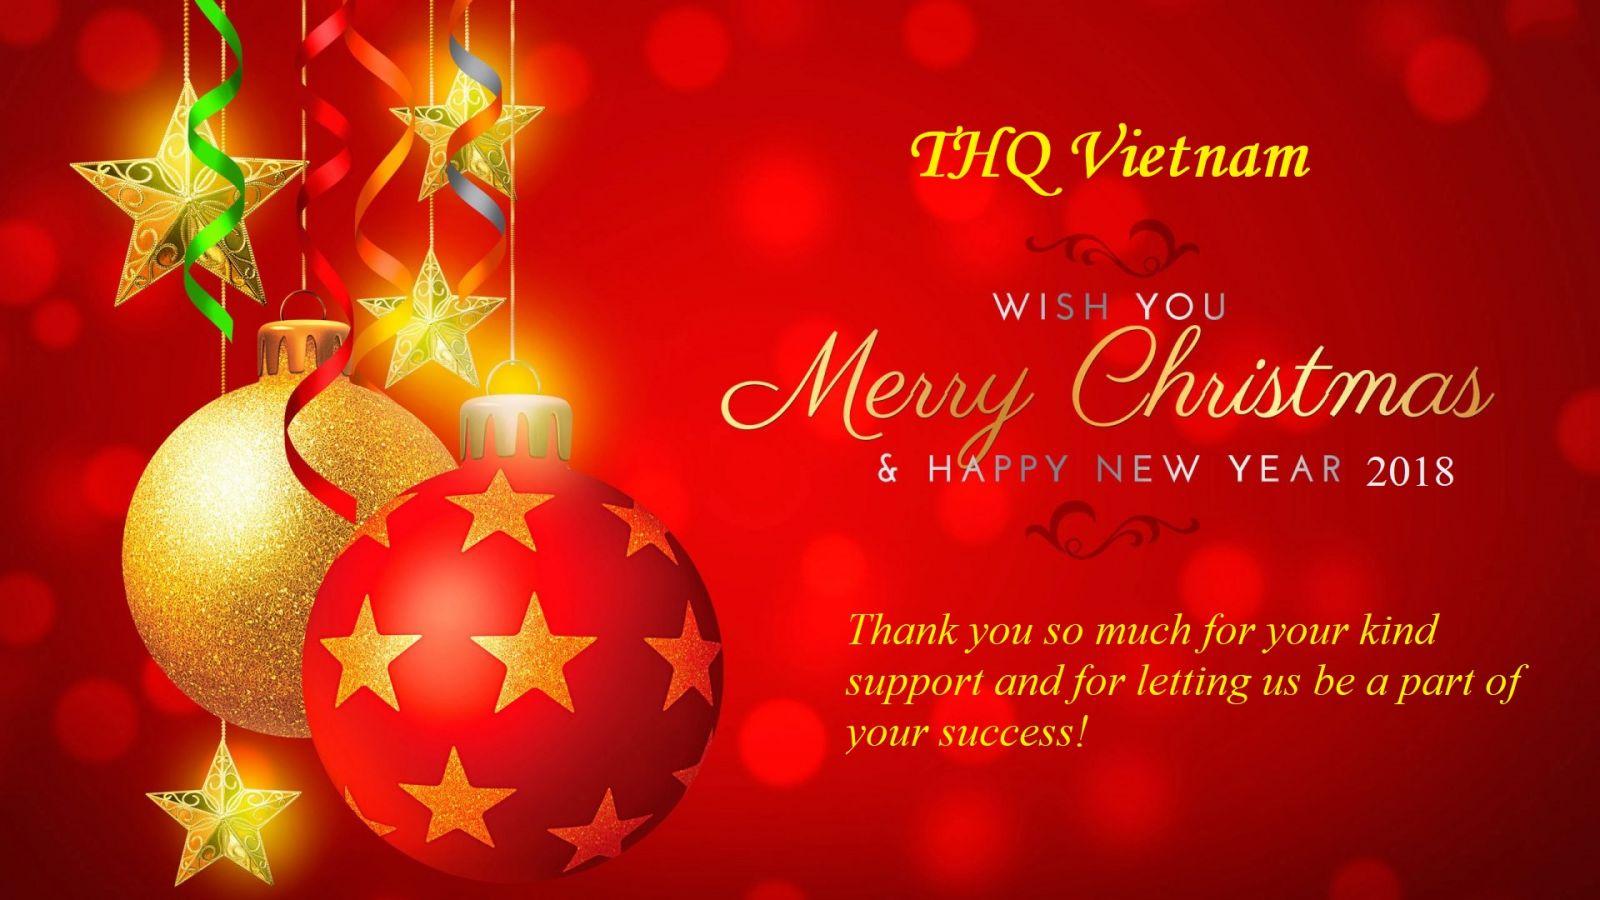 New Year 2018 in Vietnam 57